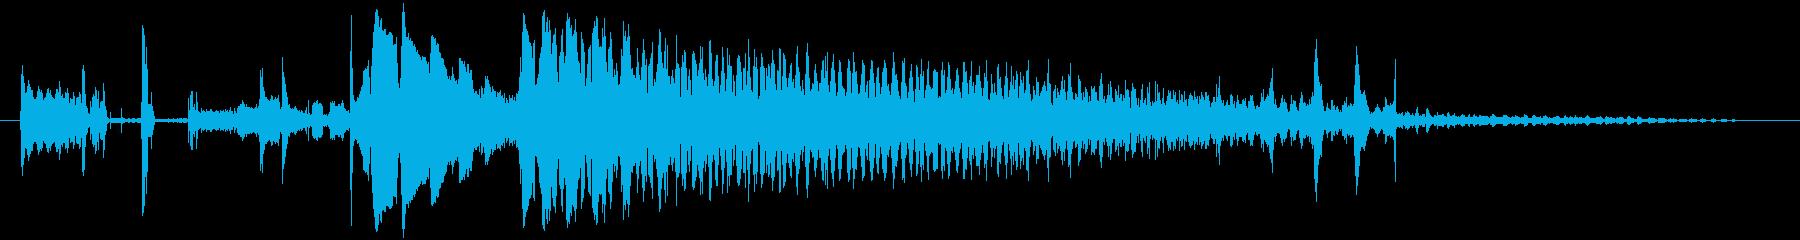 CINEMATIC BEEP 02の再生済みの波形